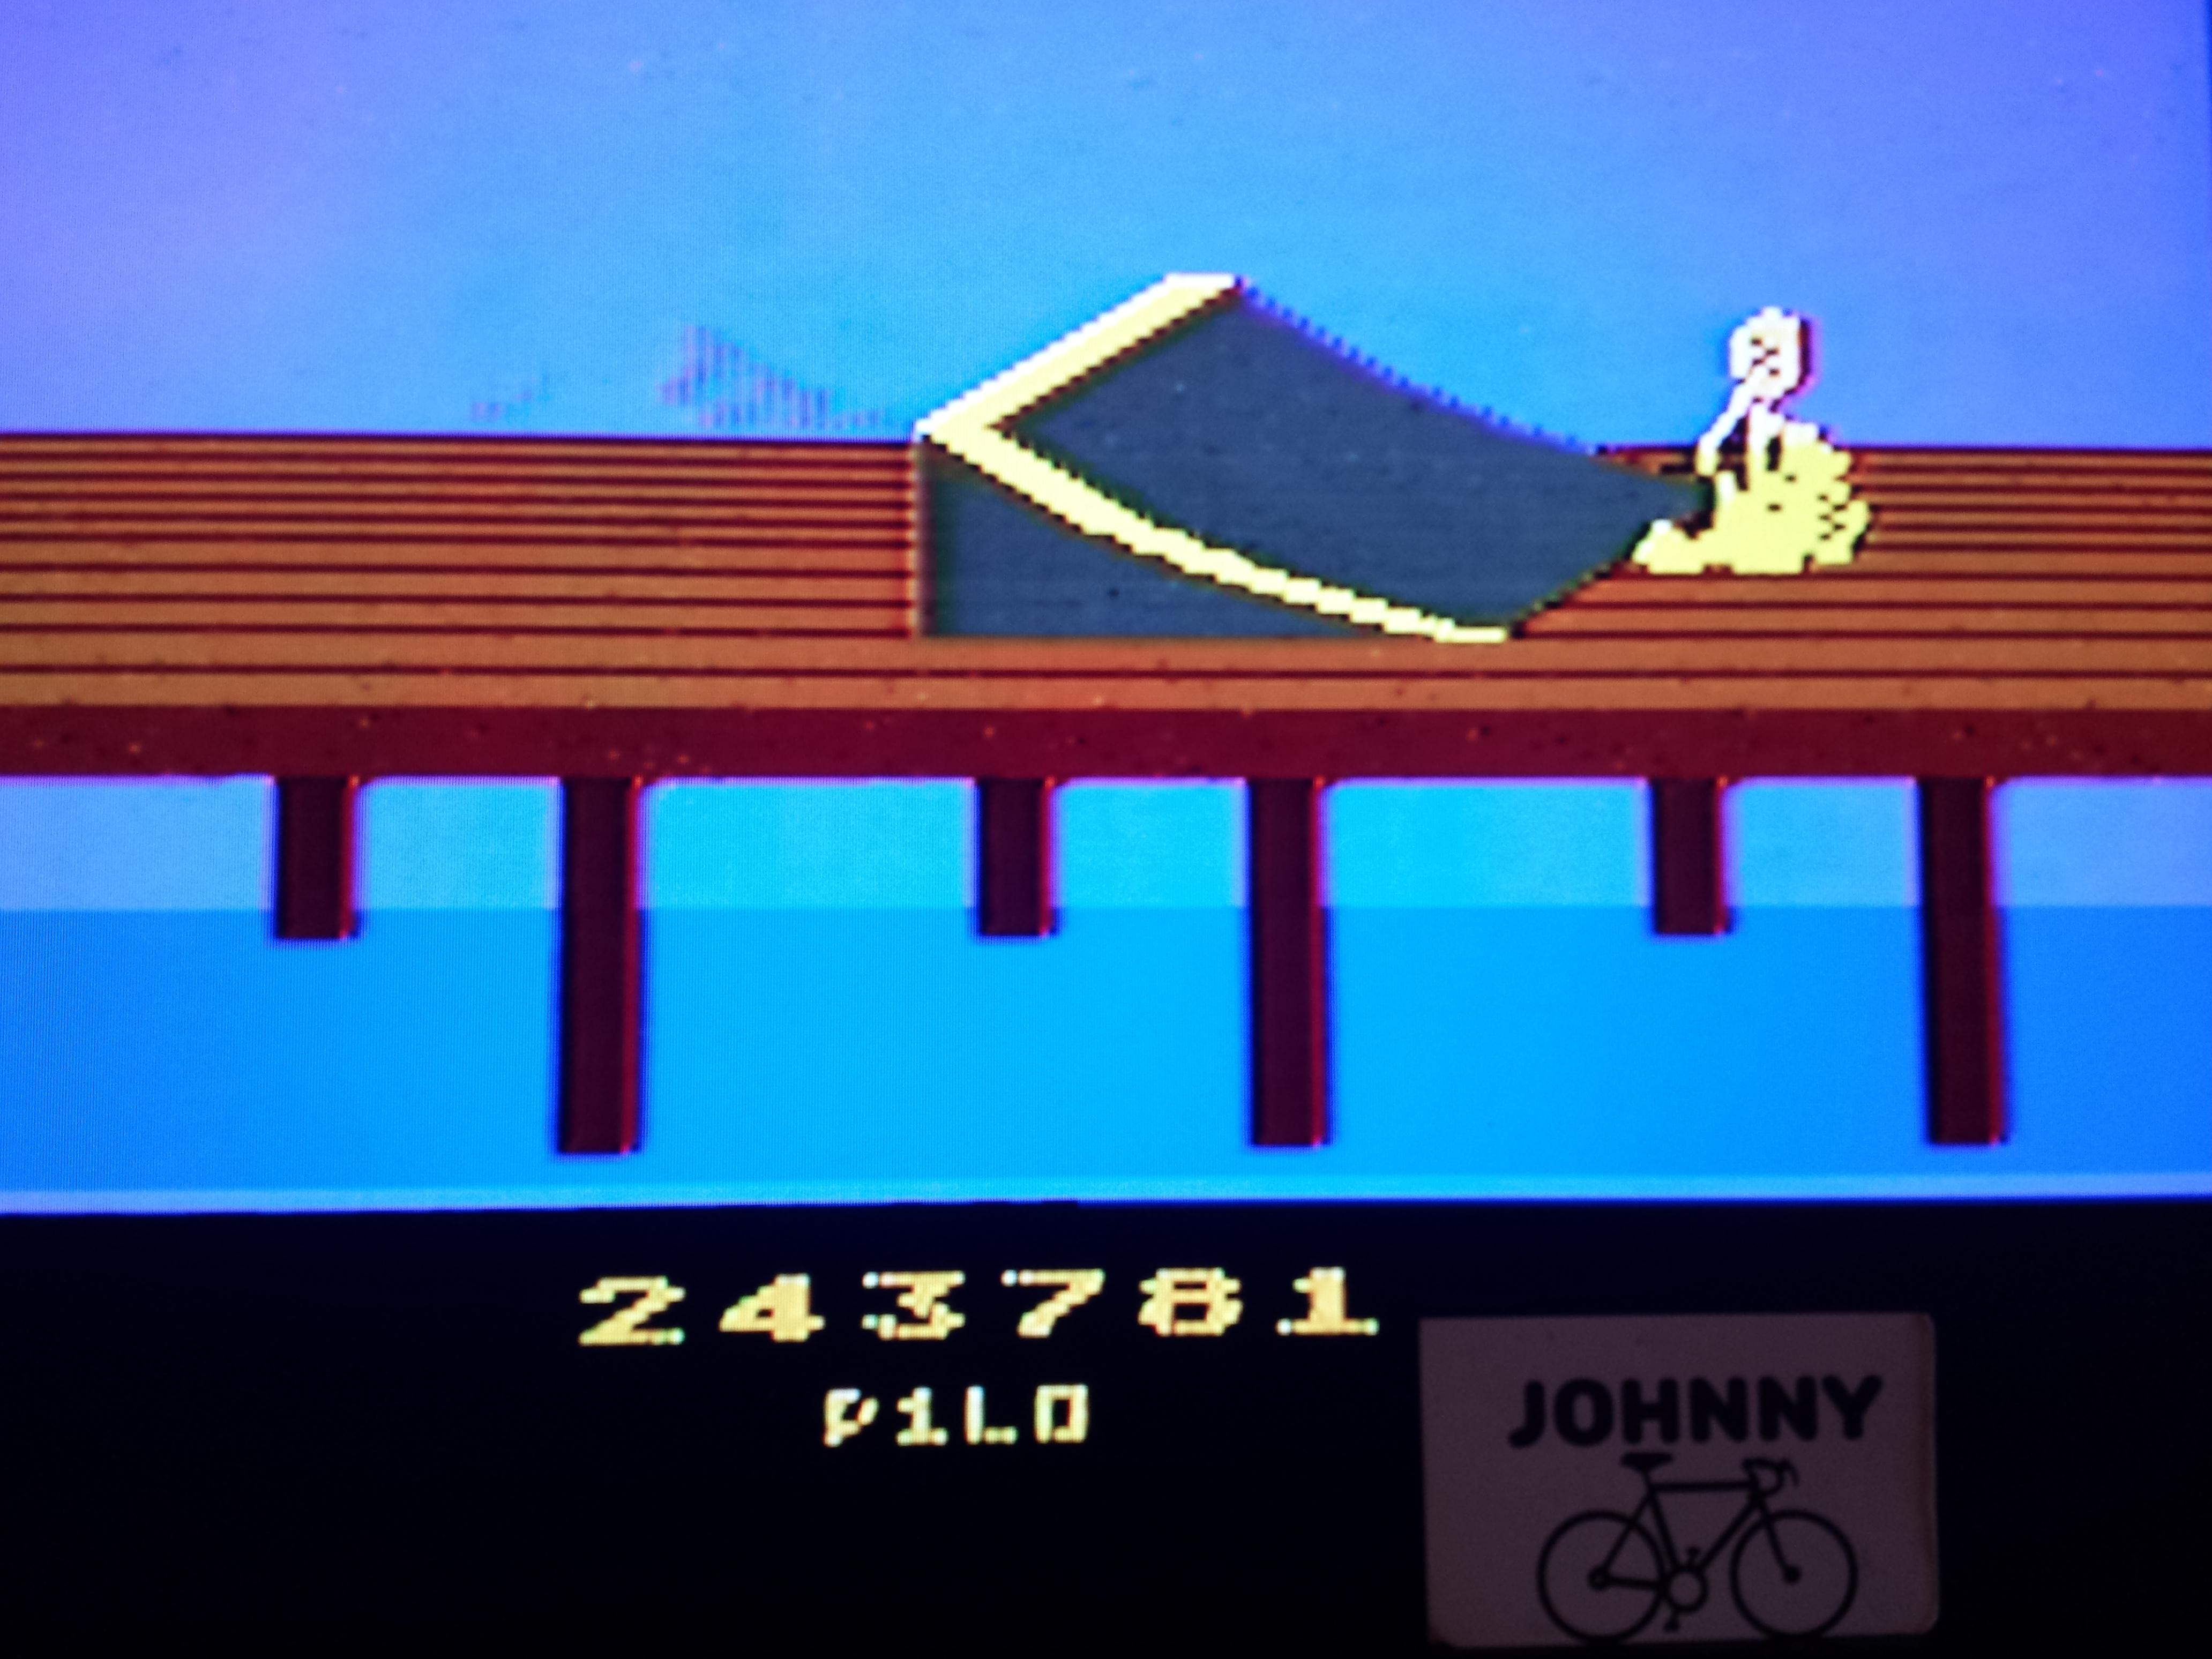 JohnnyTenspeed: BMX Airmaster: Arcade Mode (Atari 2600) 243,781 points on 2016-01-27 10:46:49